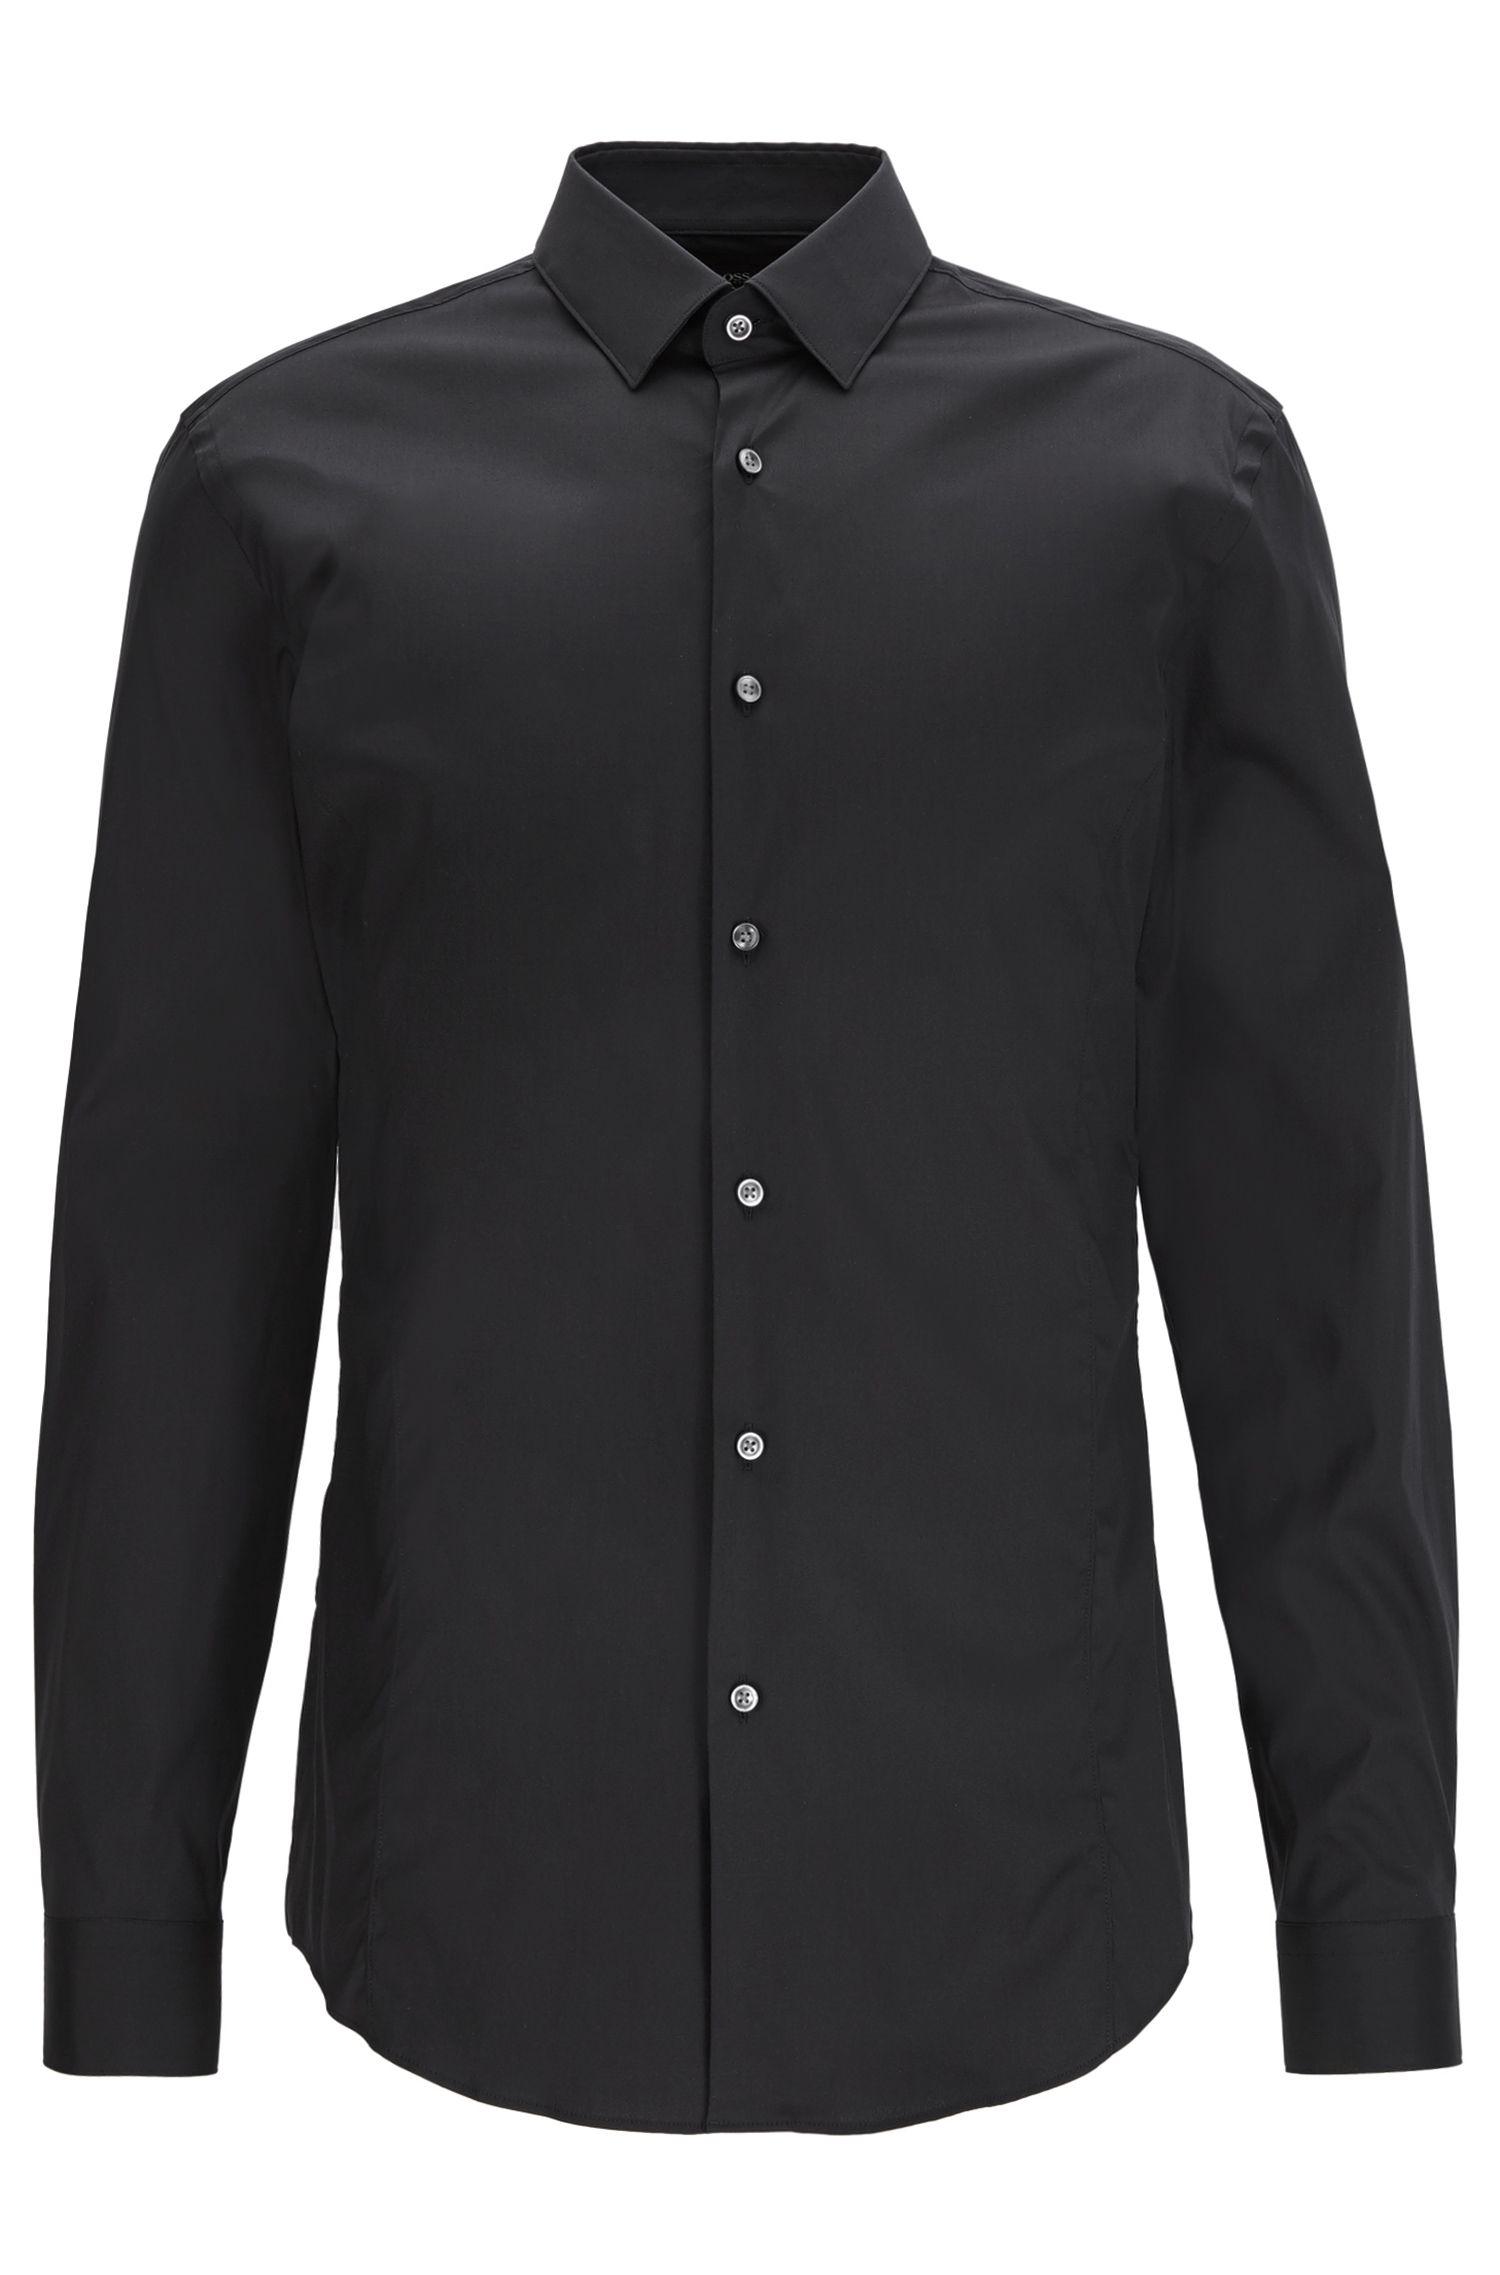 Cotton Blend Shirt, Slim Fit   Ilan